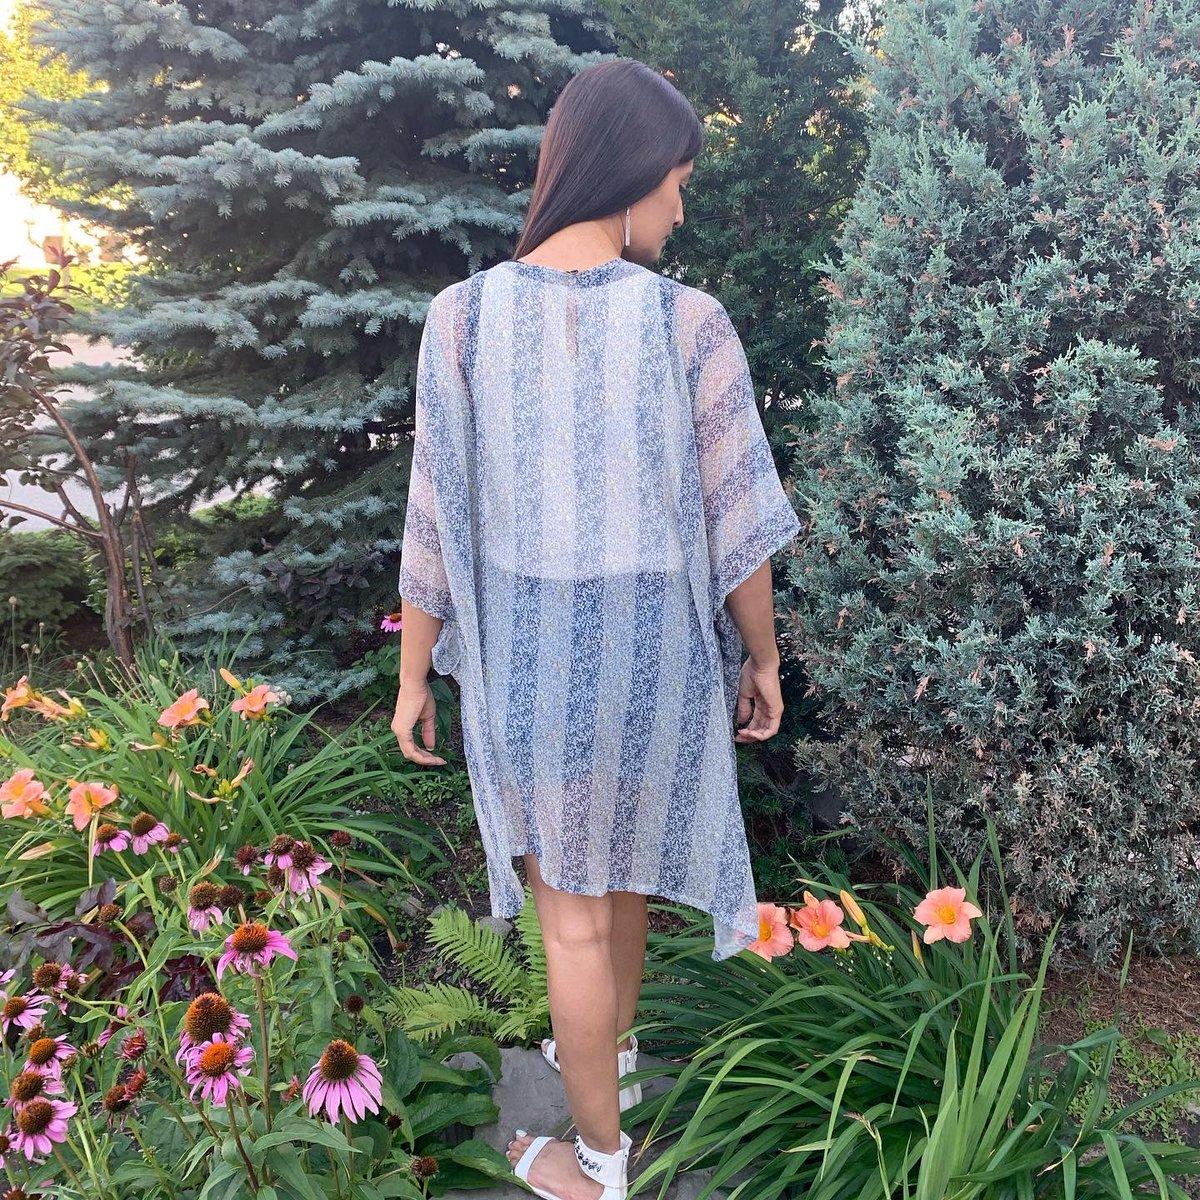 Long weekend mood. Blue beach kimono now in our Etsy shop. Size can be customized.  Shop our Kimono collection here ~ http://etsy.me/2qDoT9B #kimonostyle #coverups #weekenvibes #poolready #beachkimonos #weekendmoodpic.twitter.com/7qZn5z9sMU